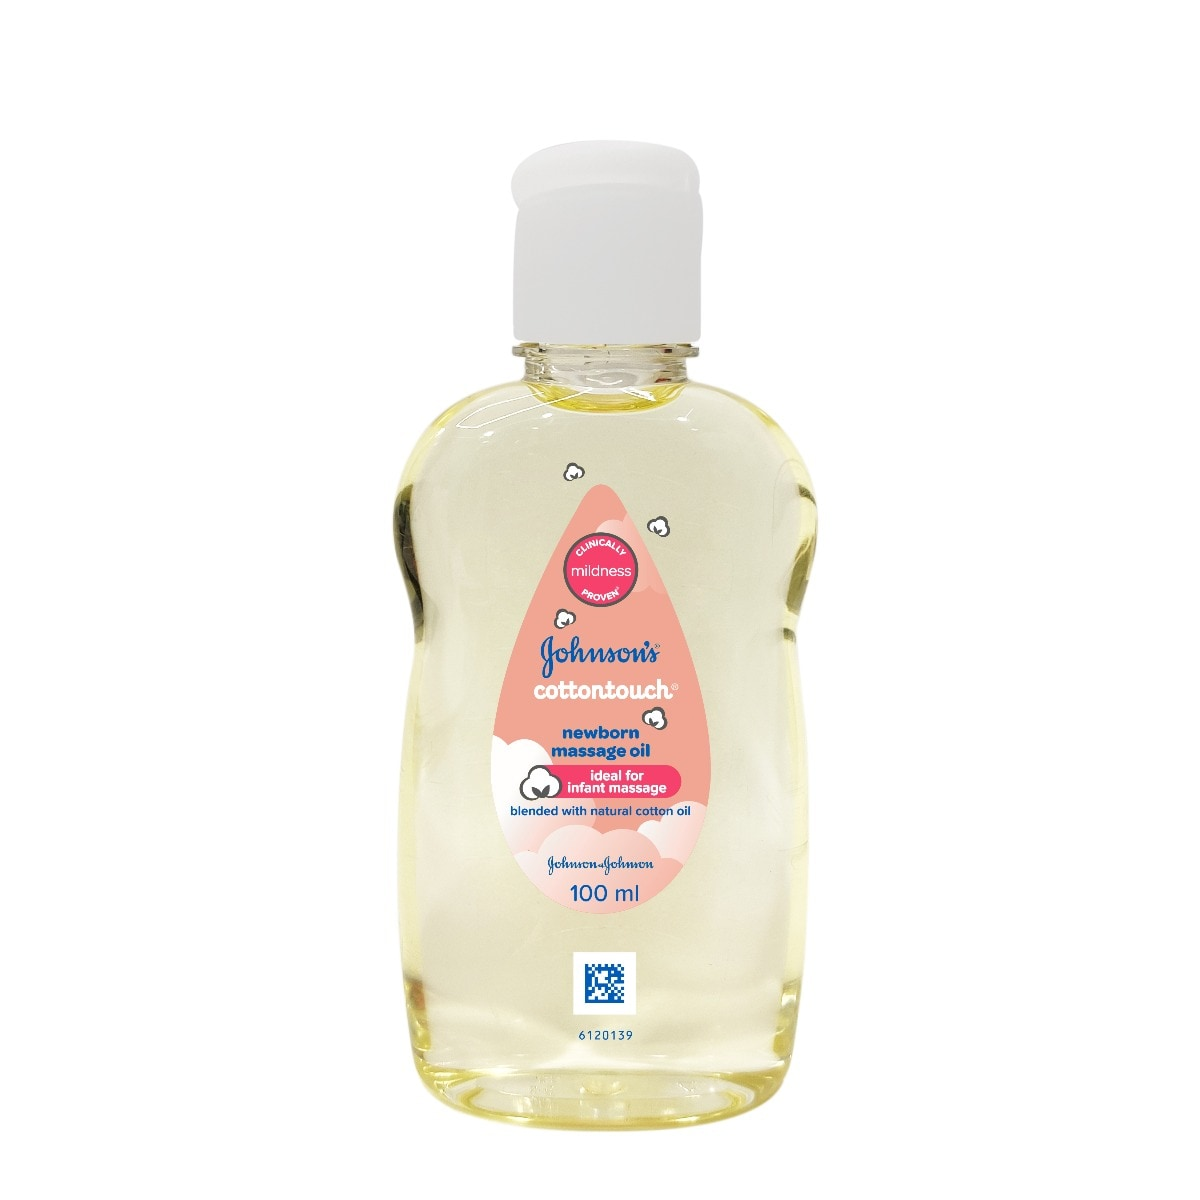 Johnson's Cottontouch New Born Massage Oil, 100 ml